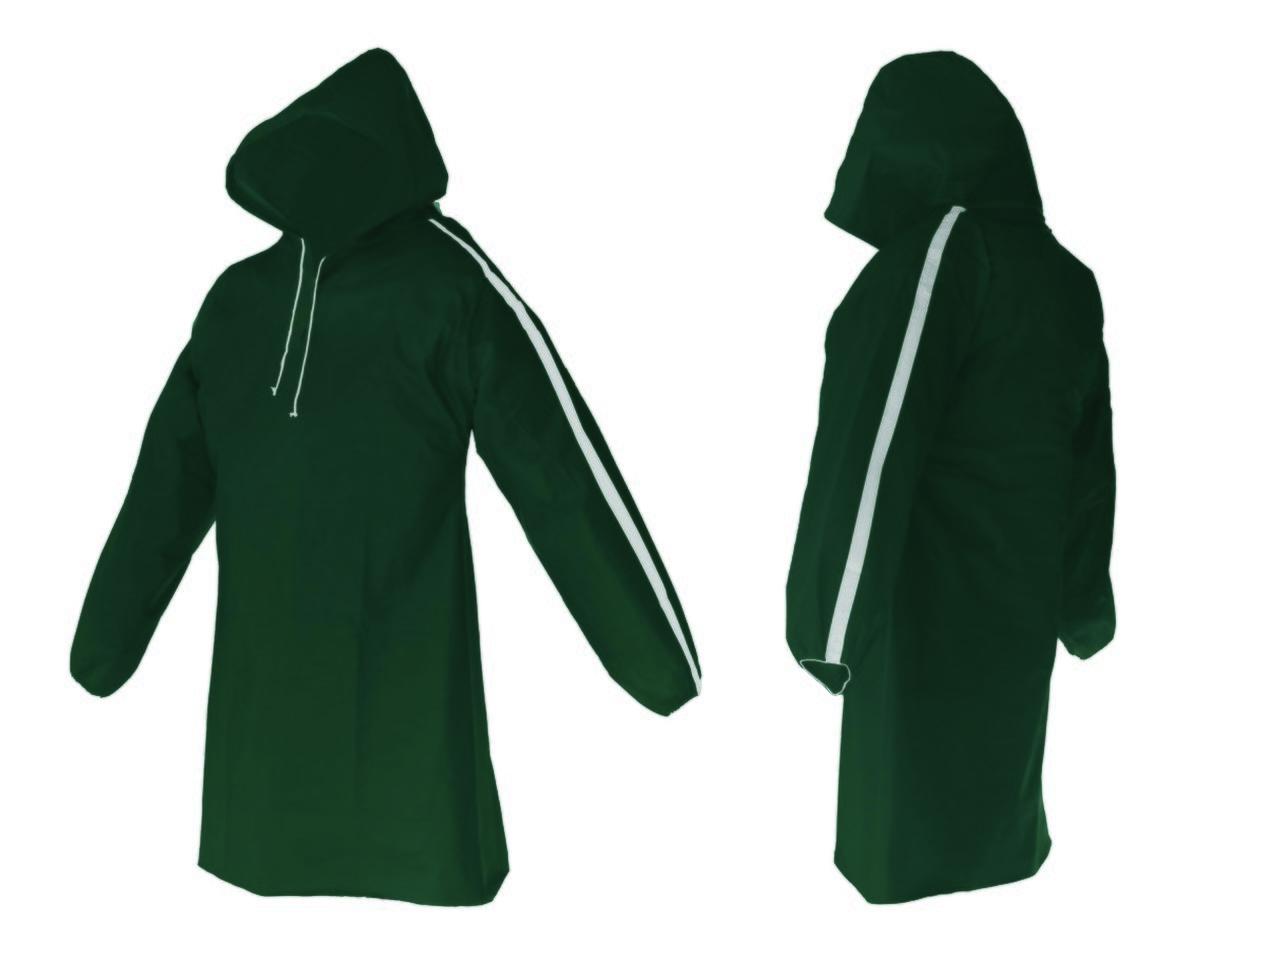 AllWeatherWare (1-Piece) Waterproof Breathable Lightweight Rain Poncho - Green